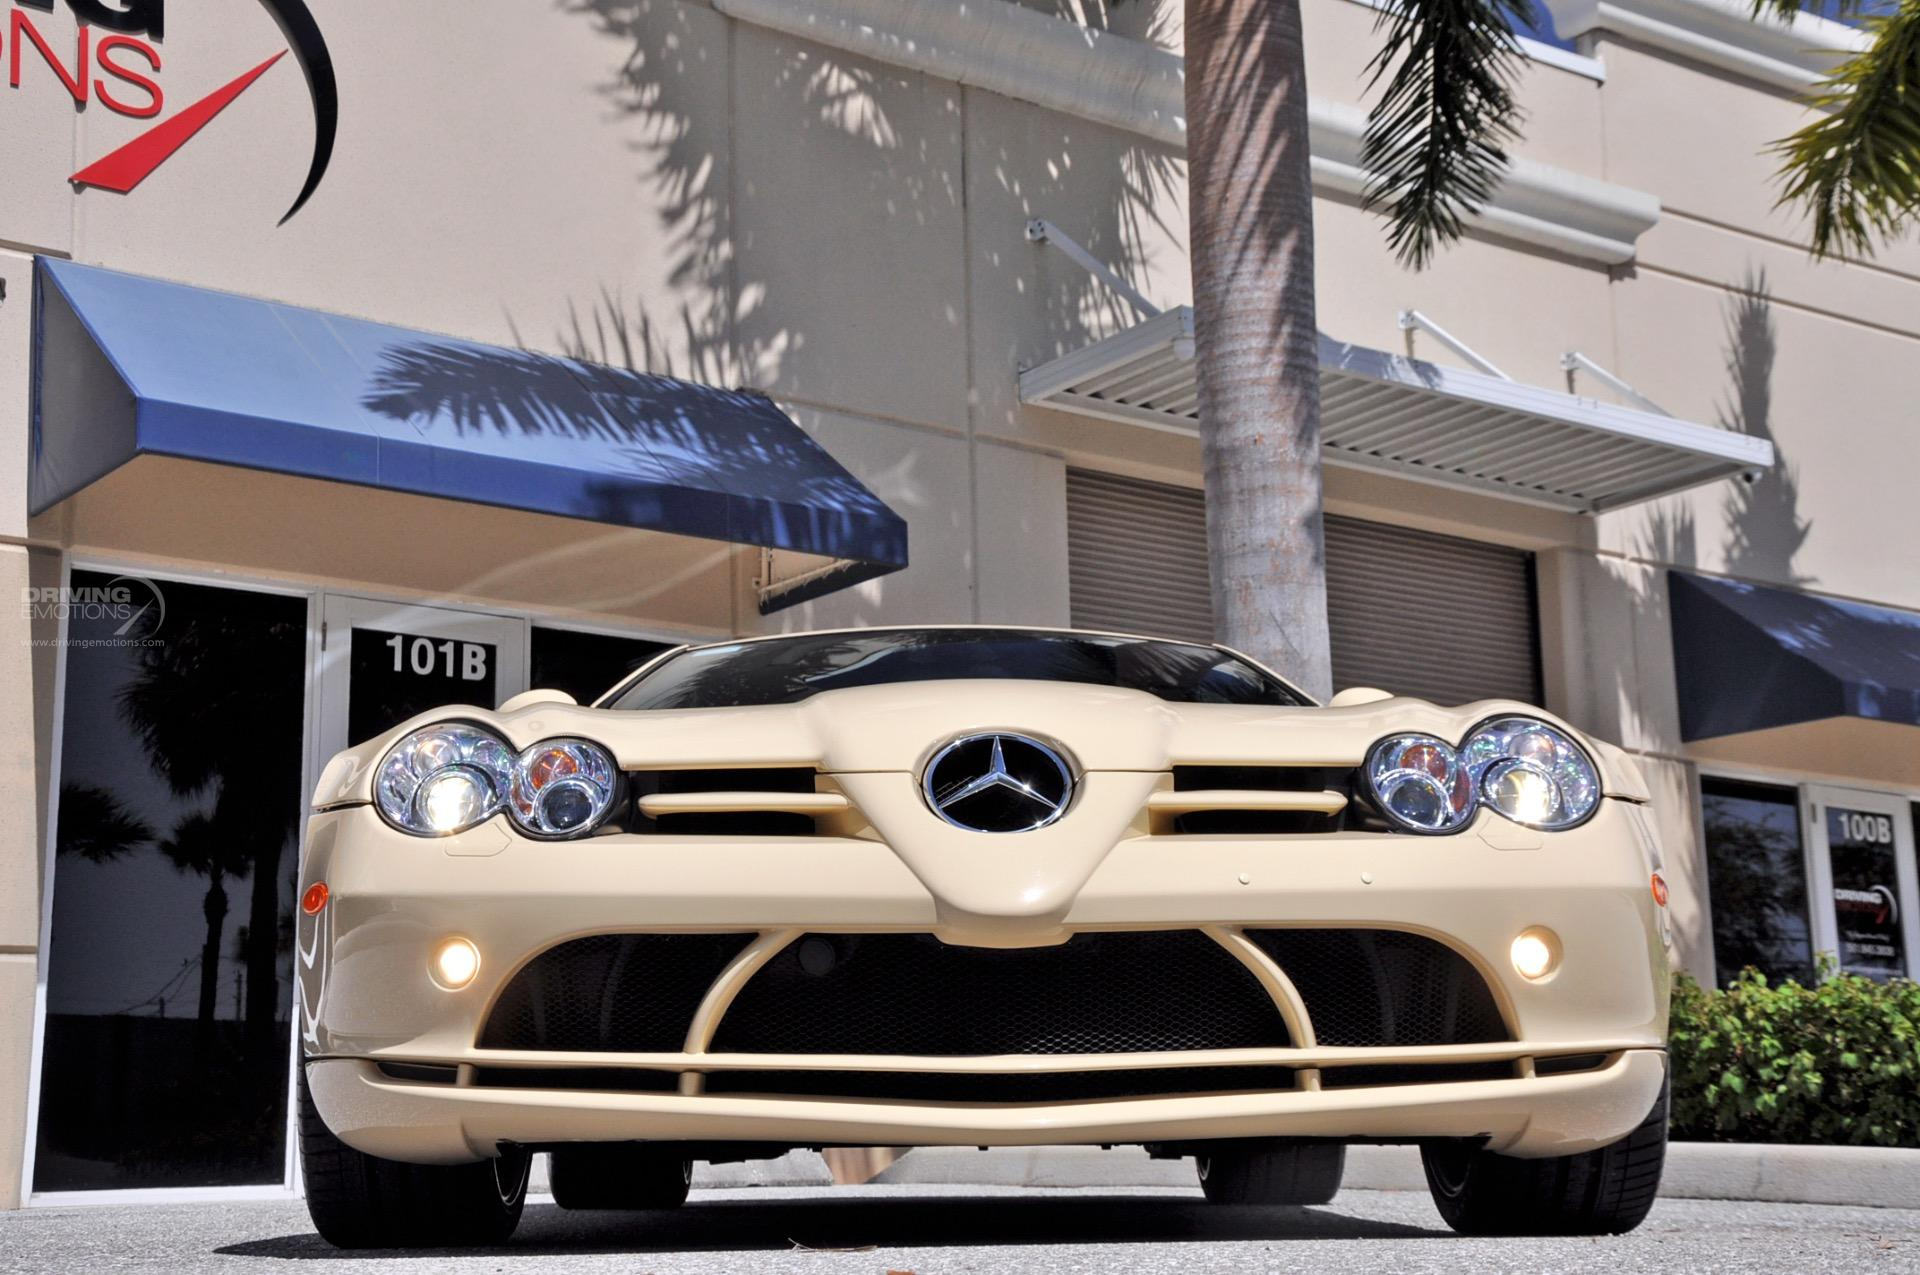 Used 2009 Mercedes-Benz SLR McLaren Roadster SLR McLaren | Lake Park, FL